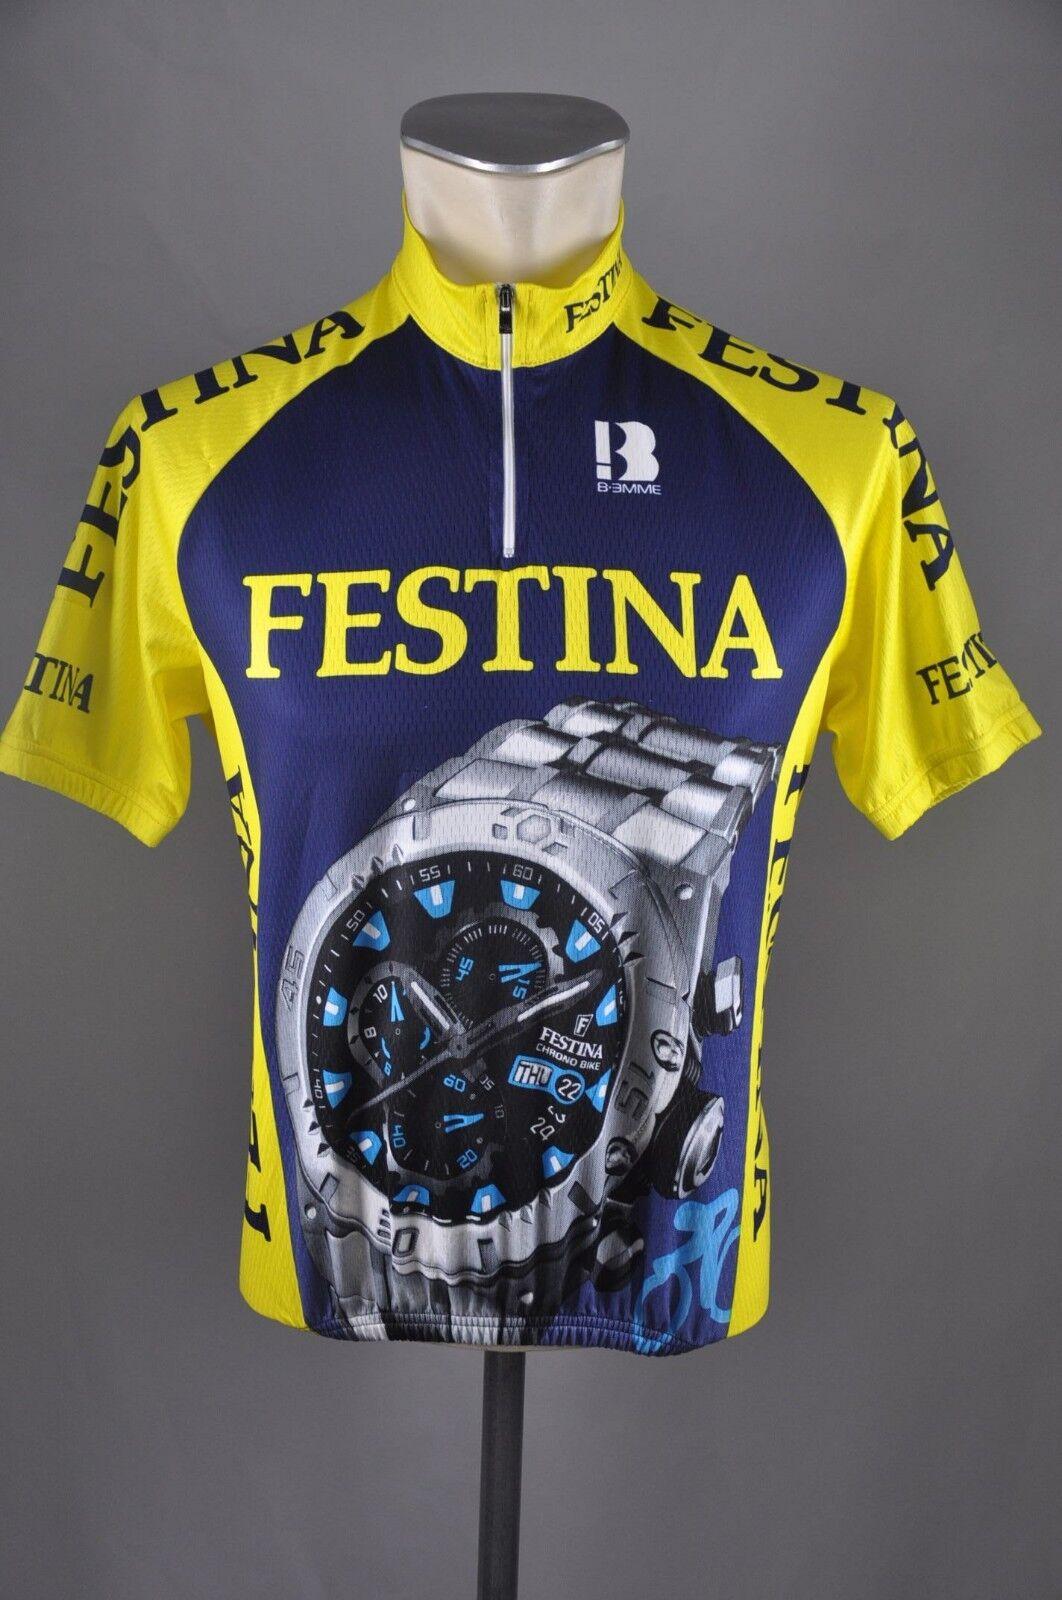 Team Festina Biemme bike Rad Trikot Gr S - 2 - 53cm jersey cycling N6